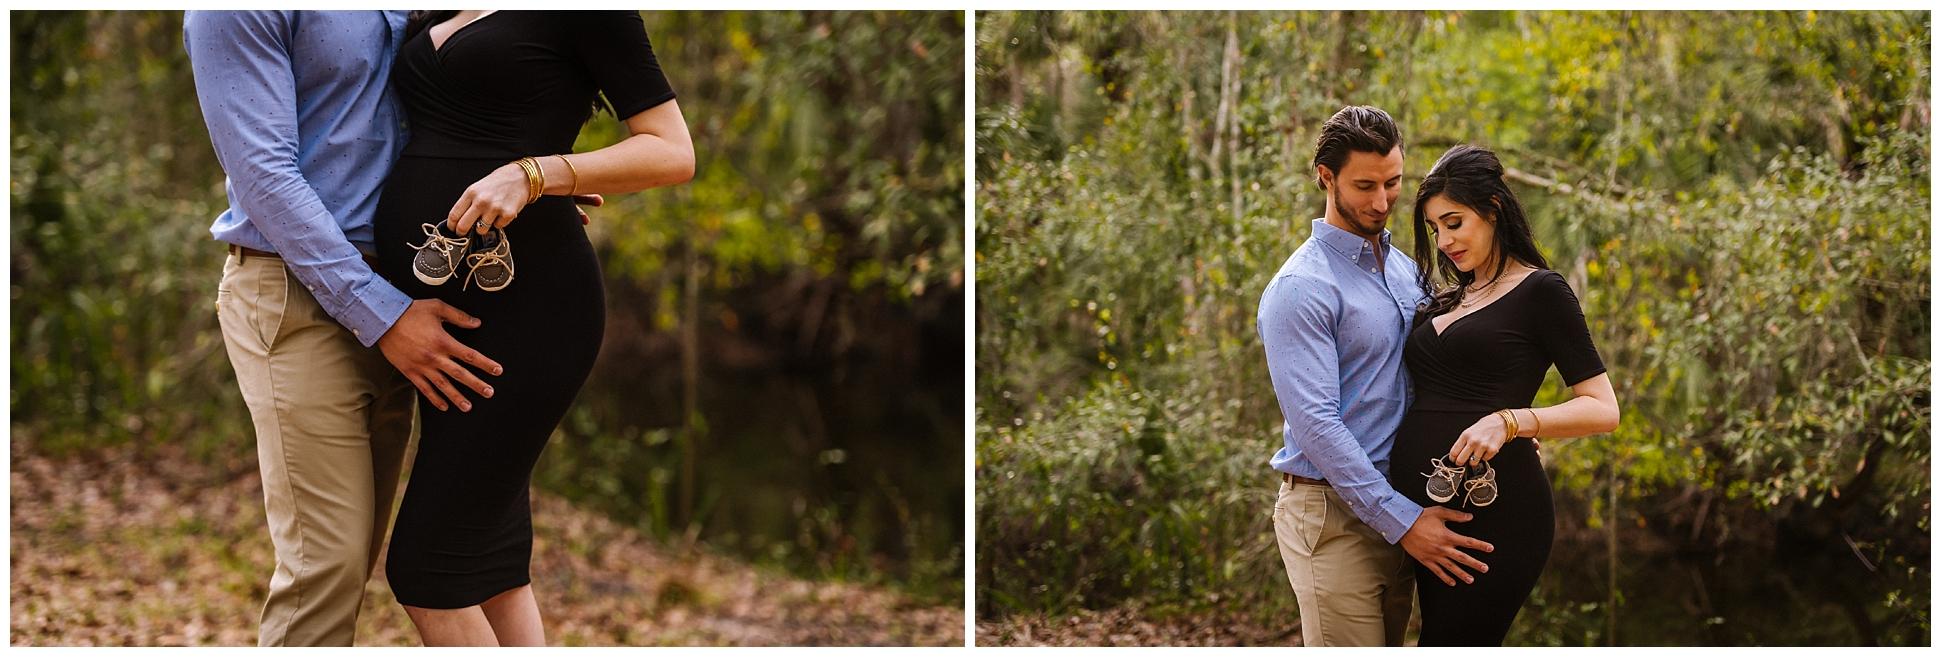 Tampa-maternity-photographer-morris-bridge-park-hip-tight-black-dress-woods_0003.jpg